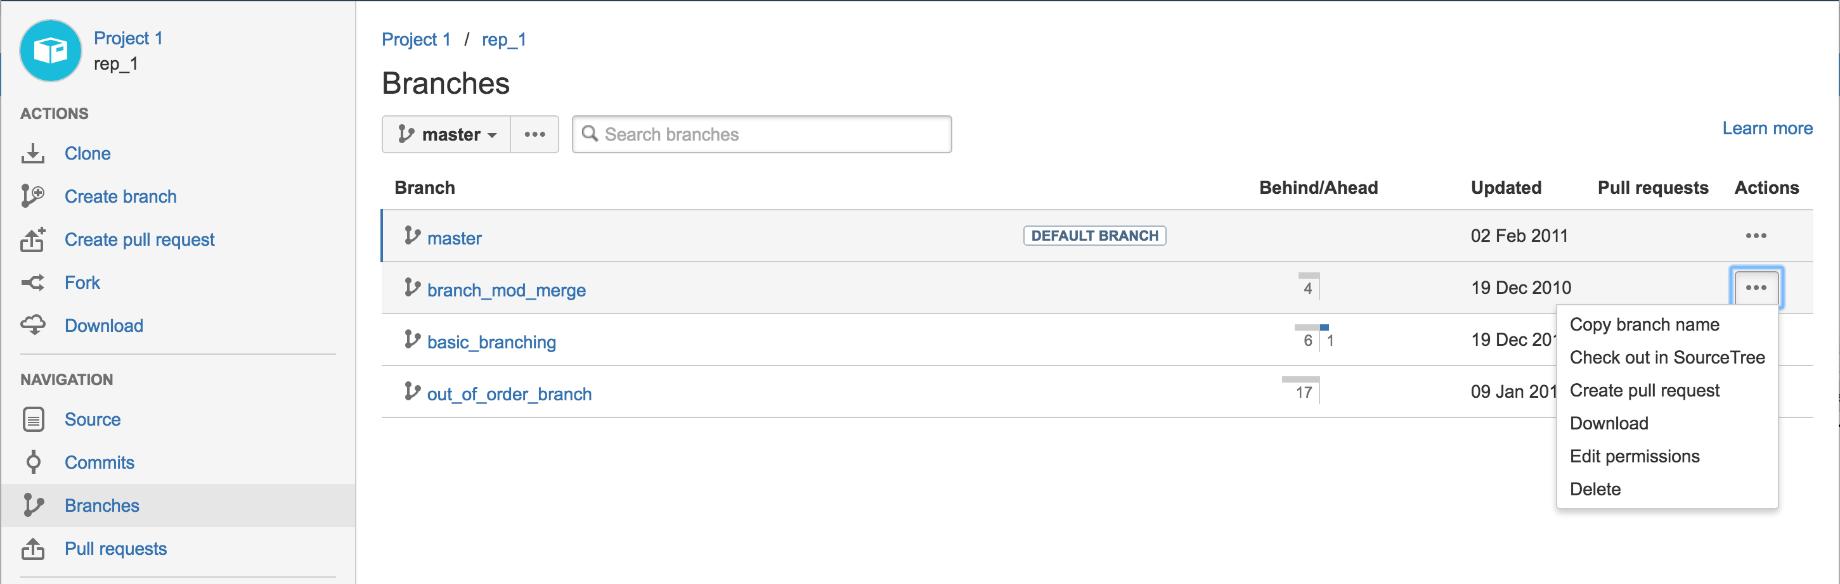 Archive Plugin for Bitbucket Server 3